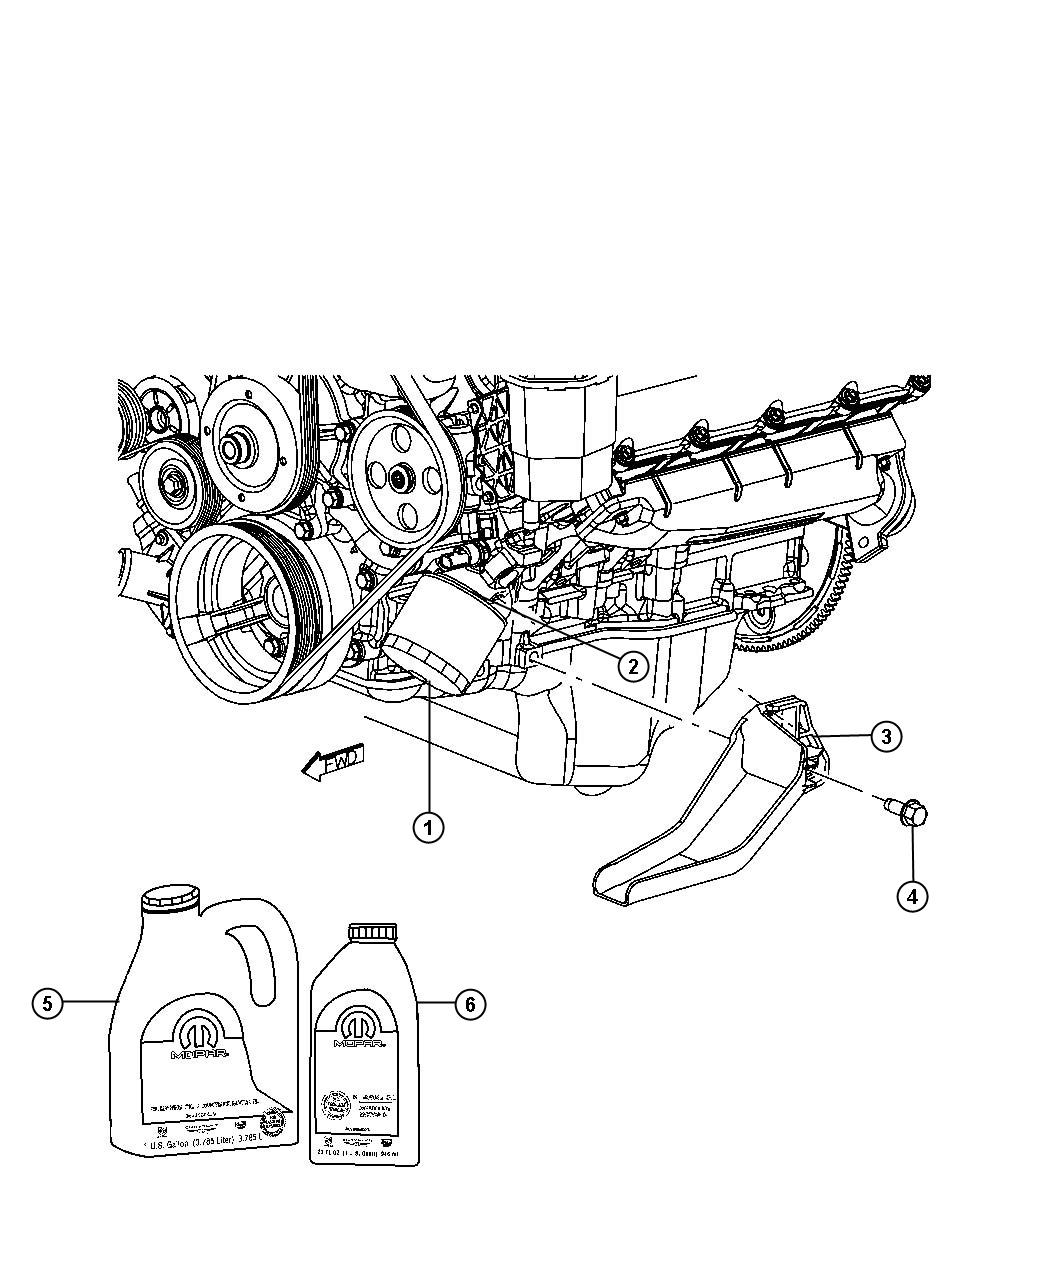 wiring diagram for 2006 chevy trailblazer autos 2002 trailblazer